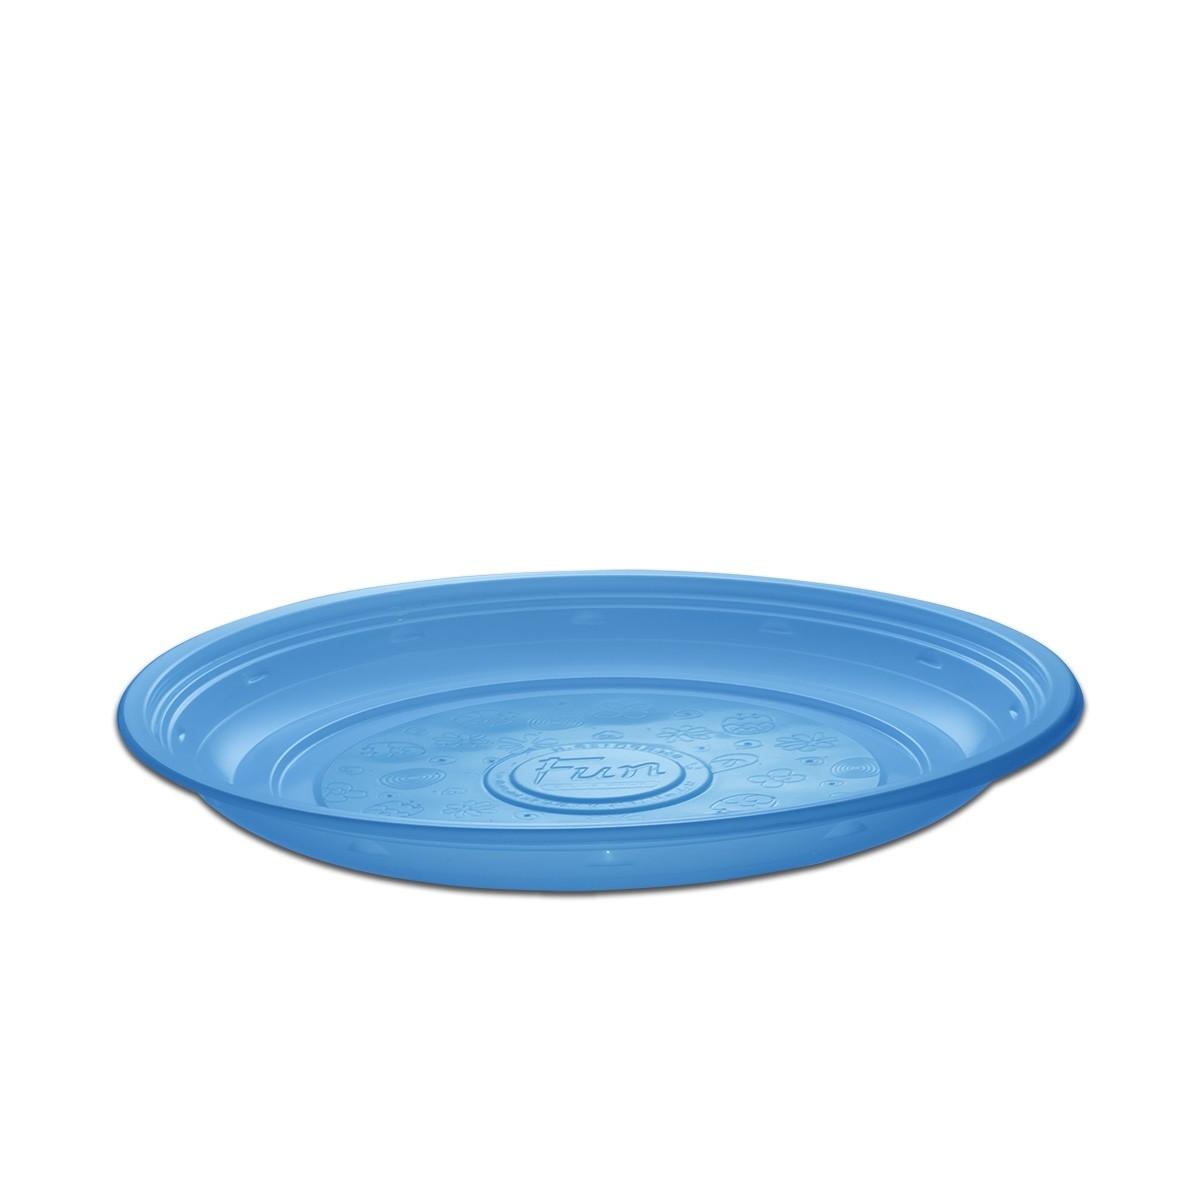 Roundpac Round Plate ⌀26cm - PP/Blue Deluxe | 25pcsx10pkts